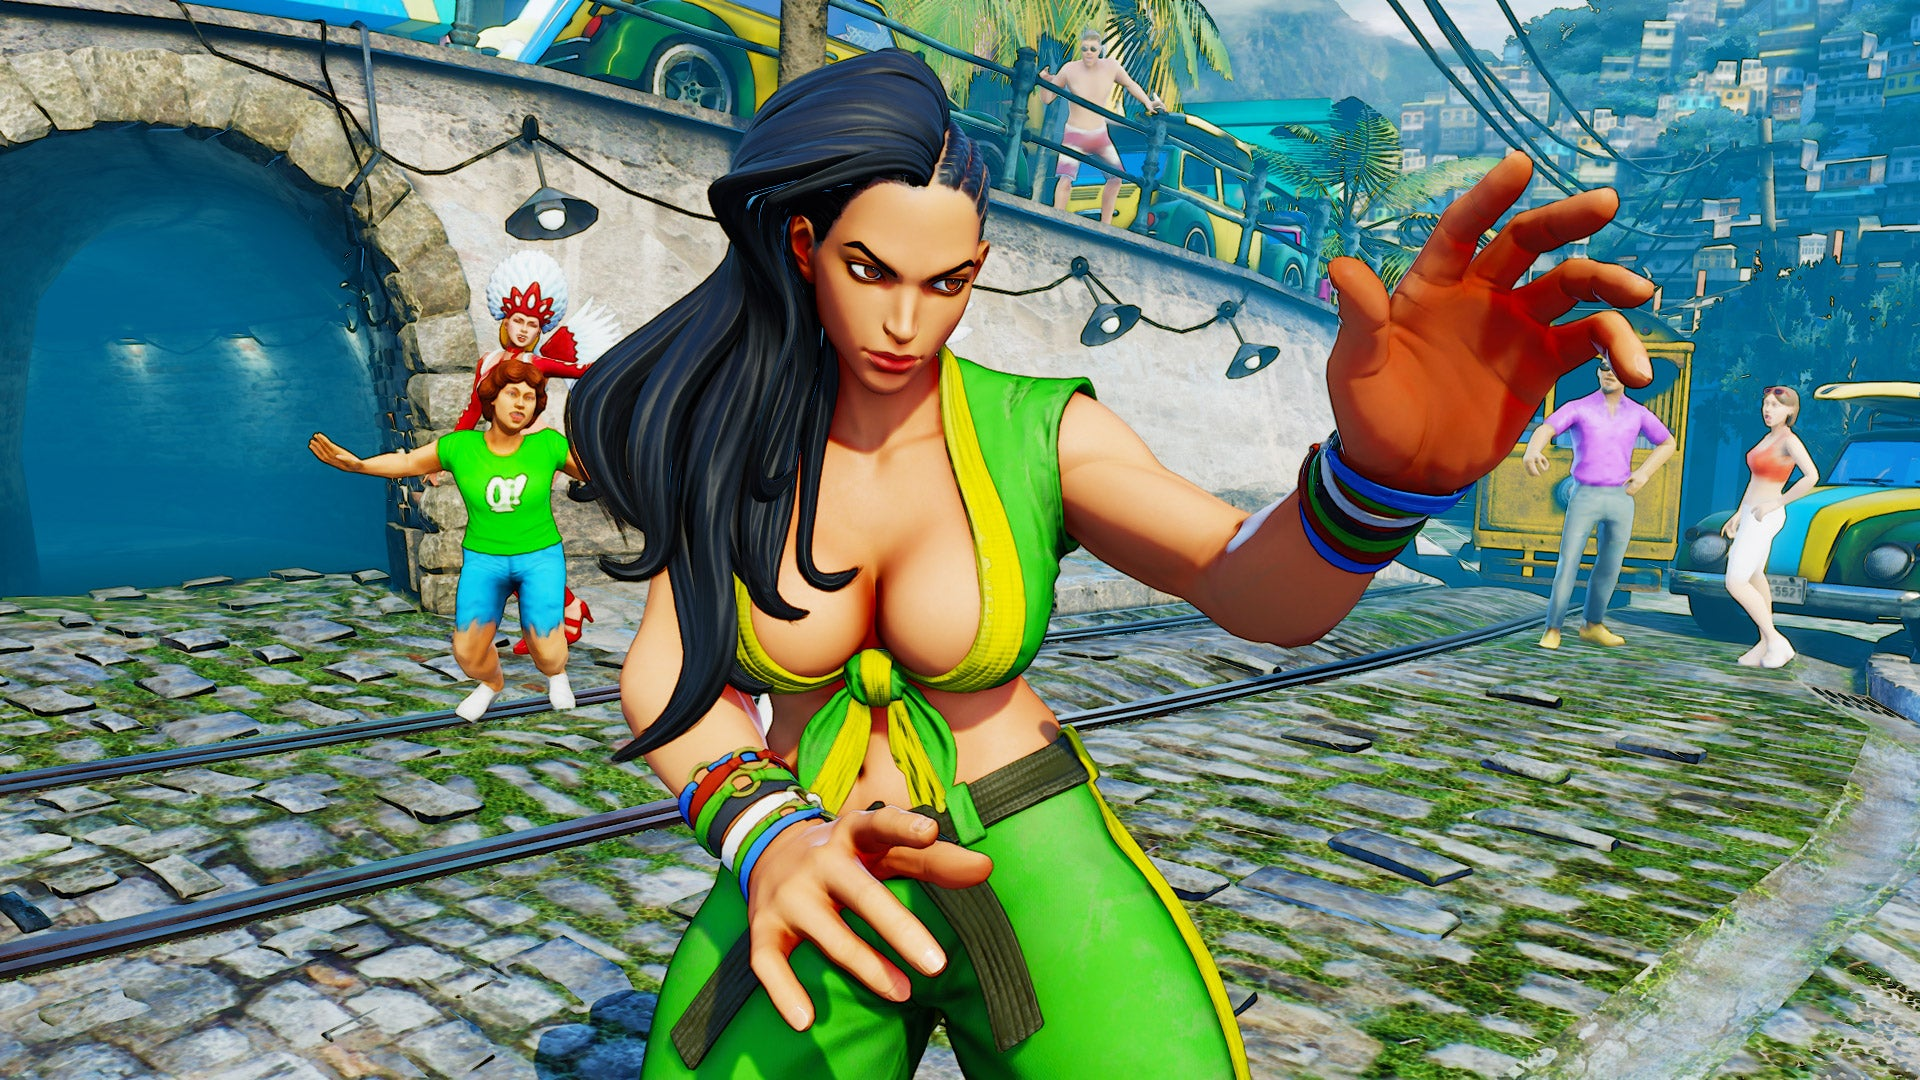 Street Fighter V, Turned Into Nightmare Fuel